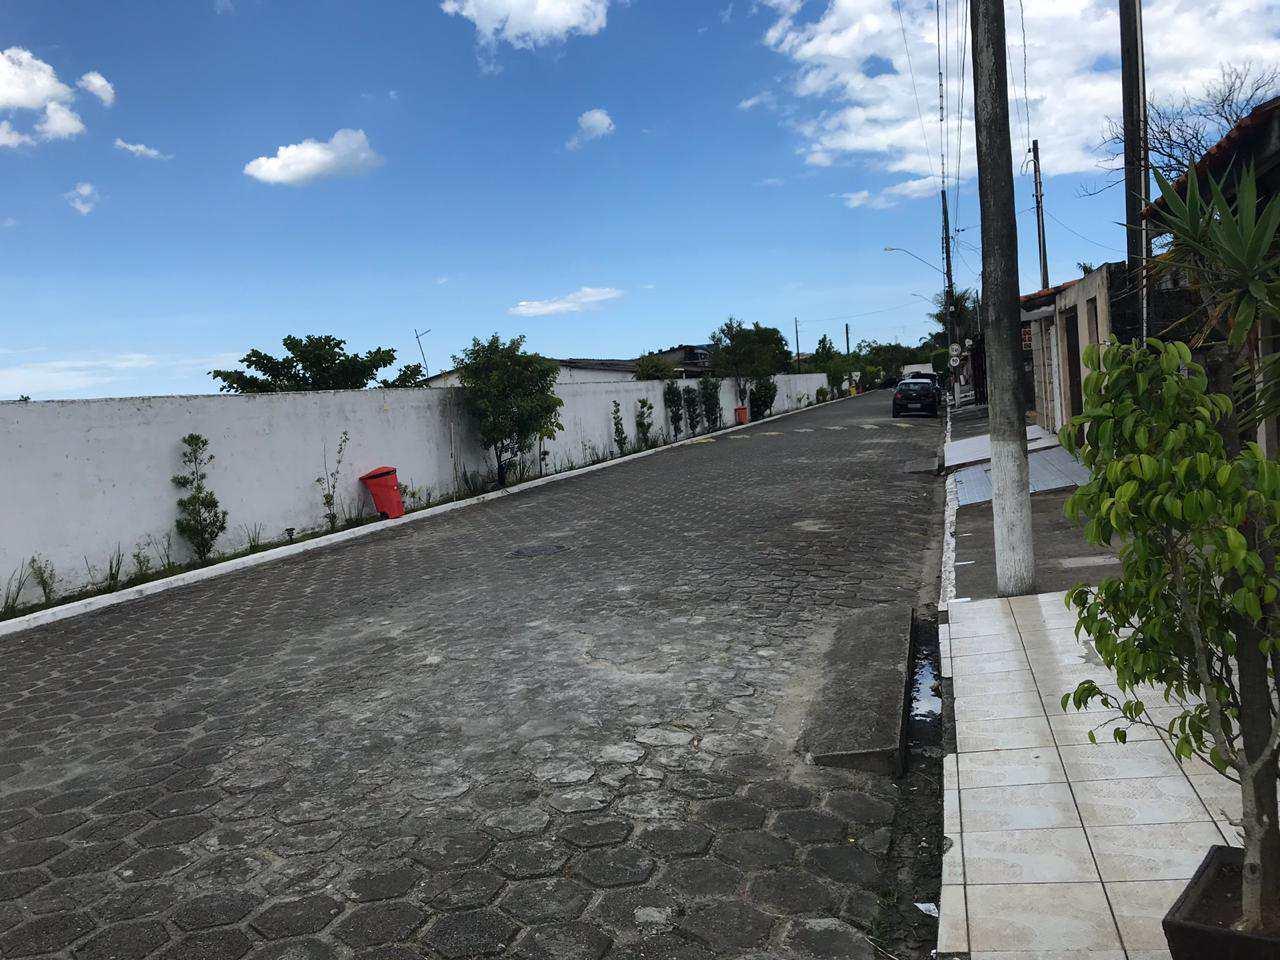 Lote em condomínio fechado na região do Jardim Oásis